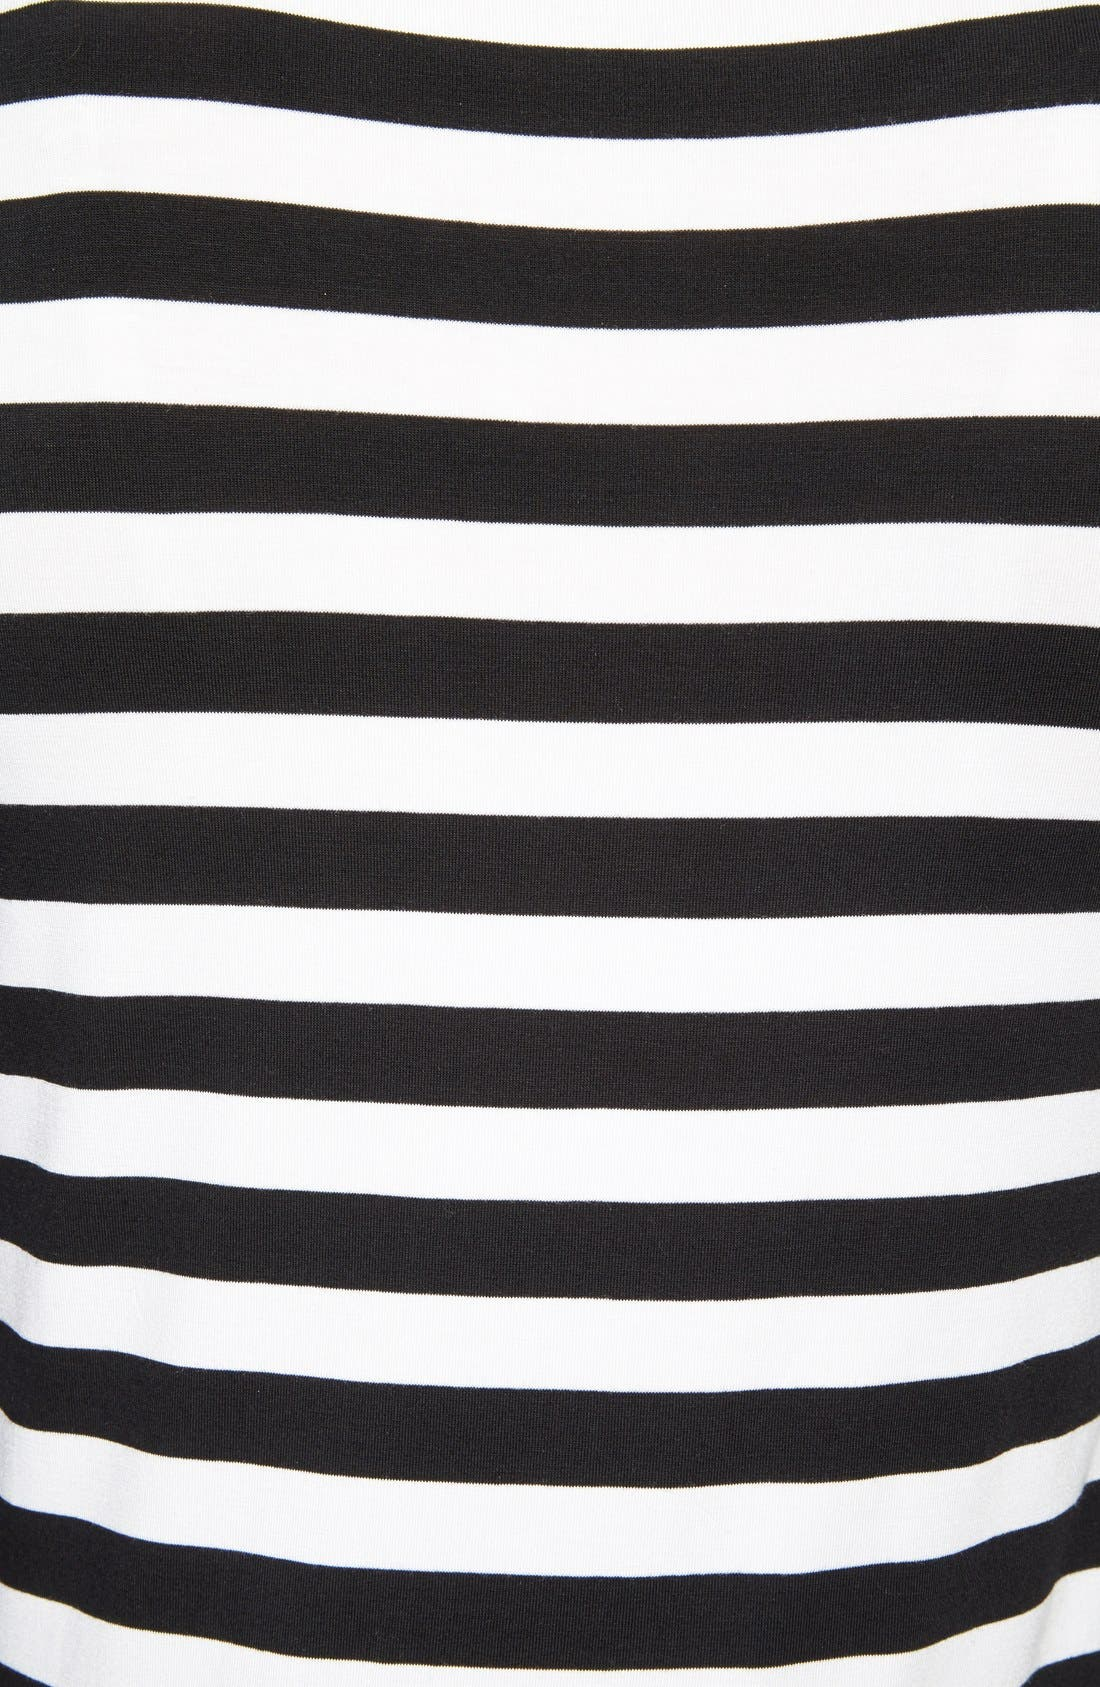 Stripe Long Sleeve Dress,                             Alternate thumbnail 2, color,                             001